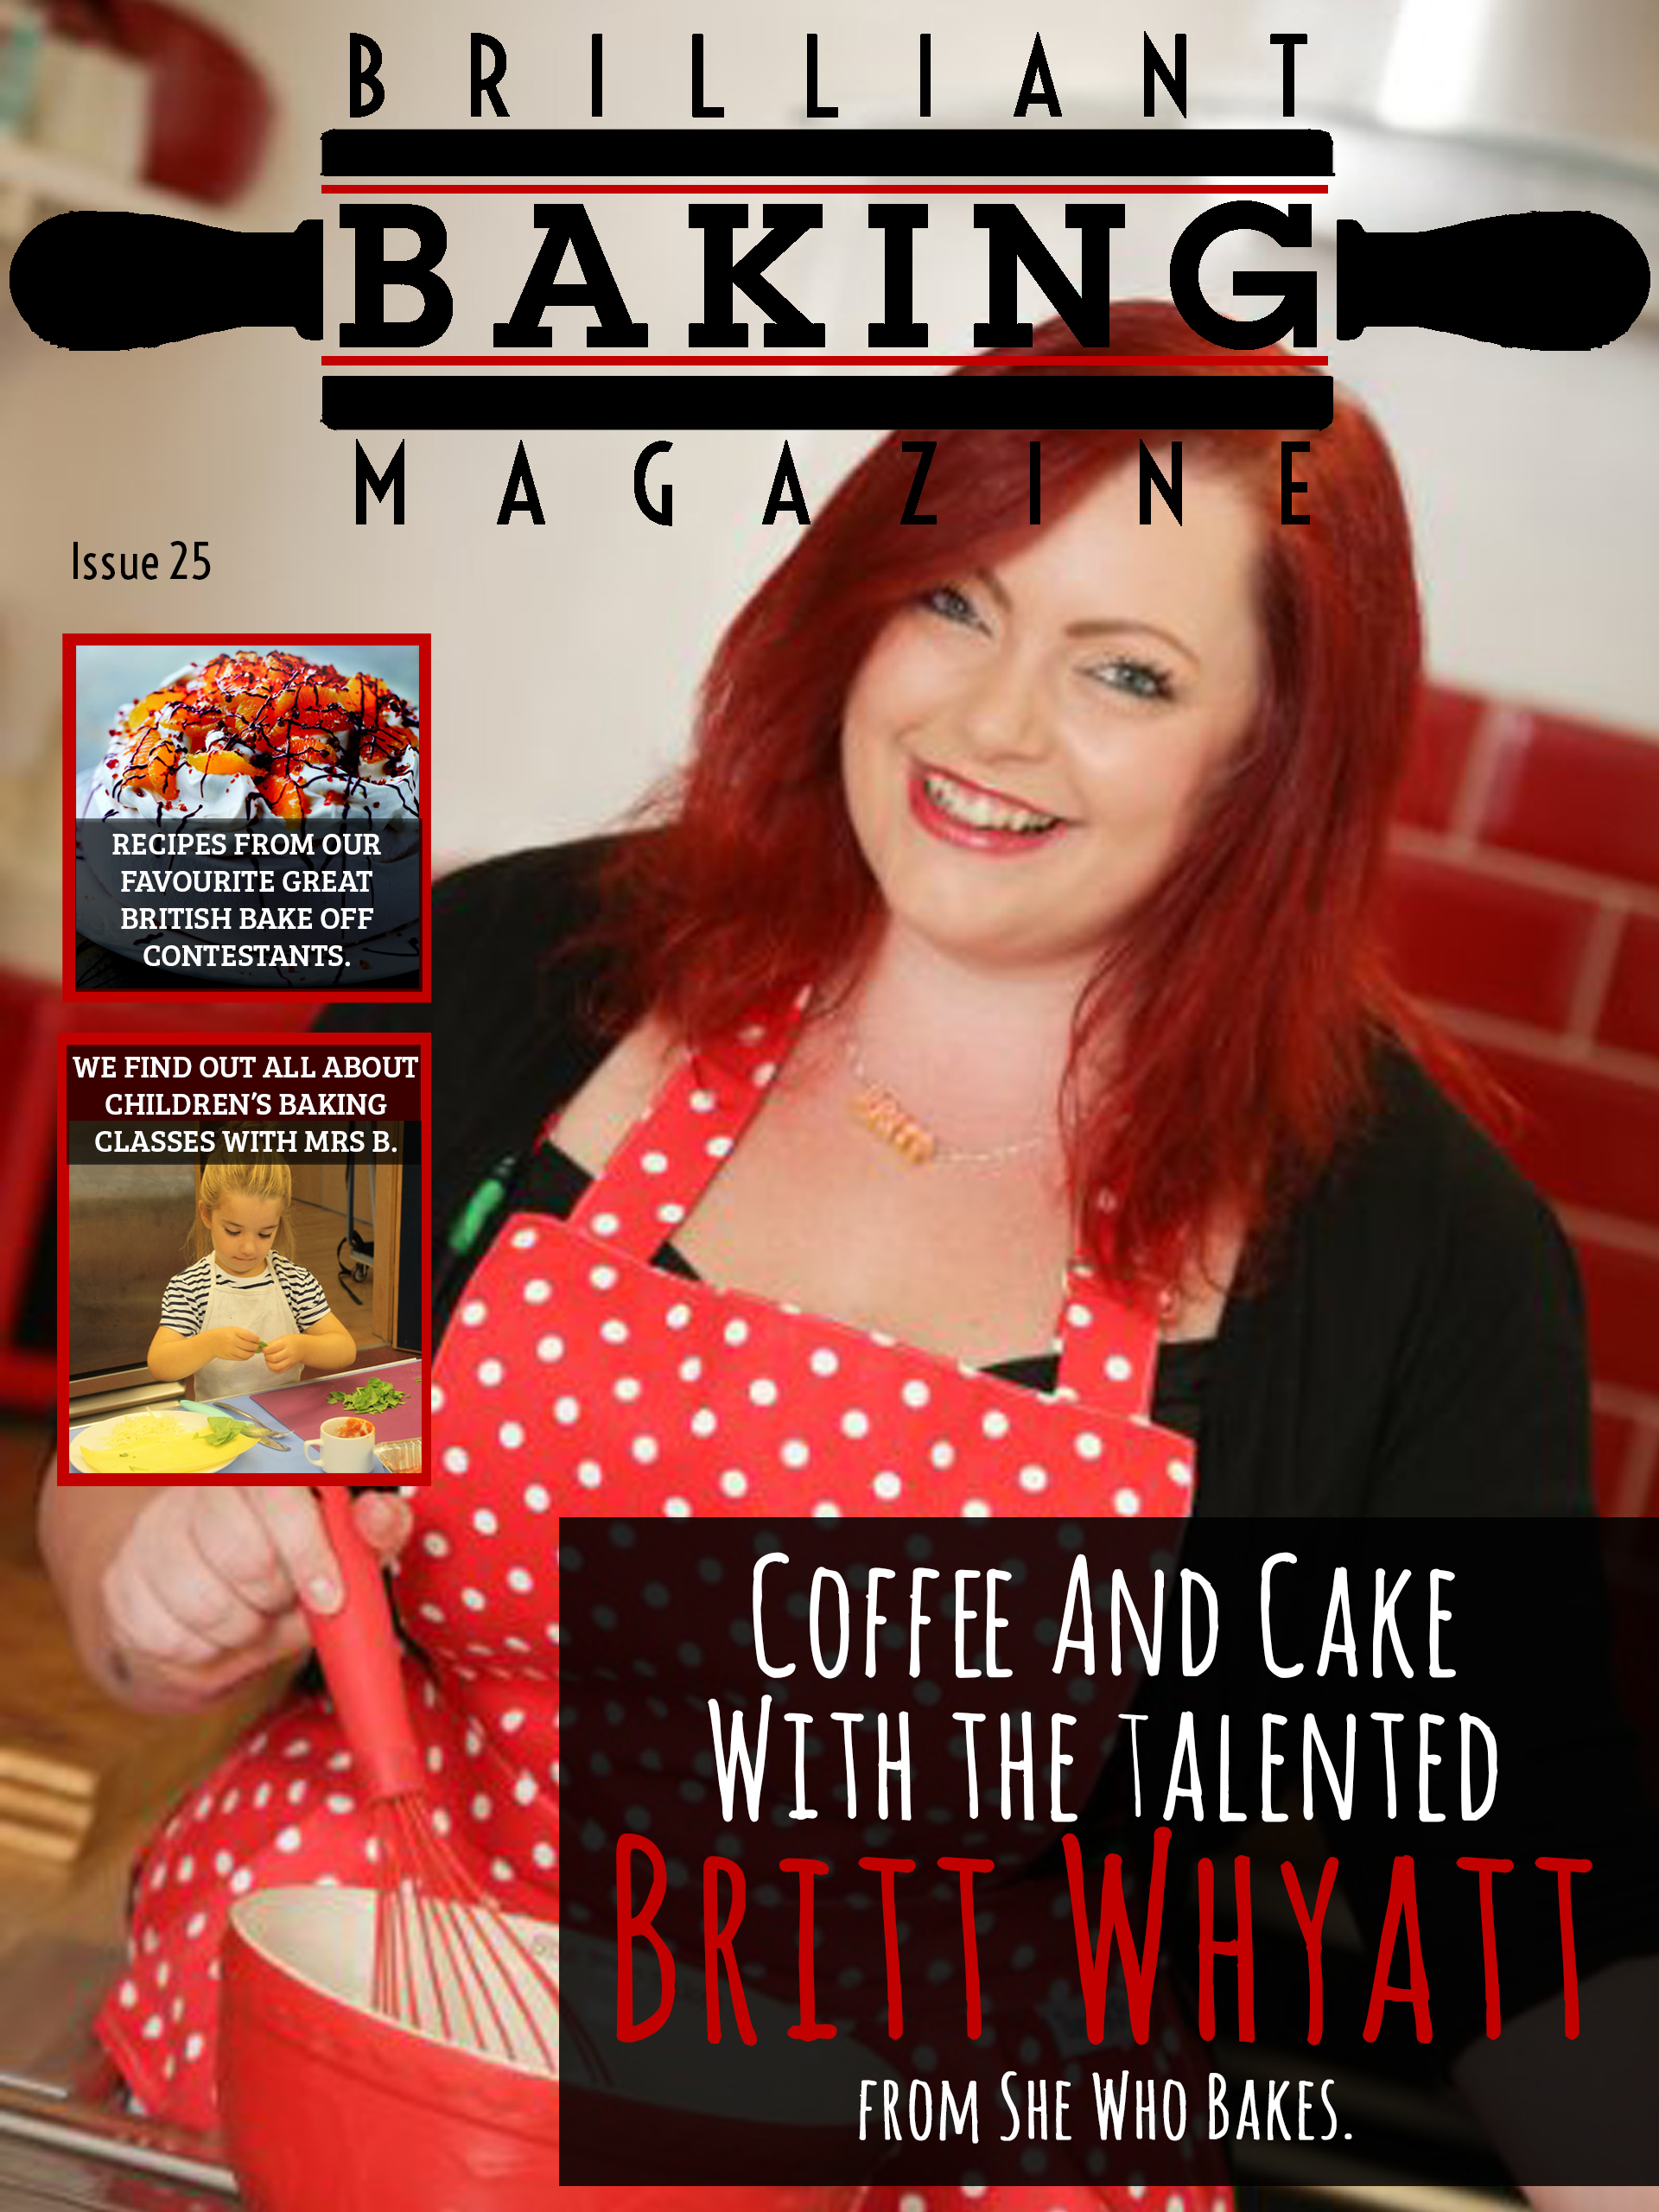 Brilliant Baking Magazine October 2016 Cover